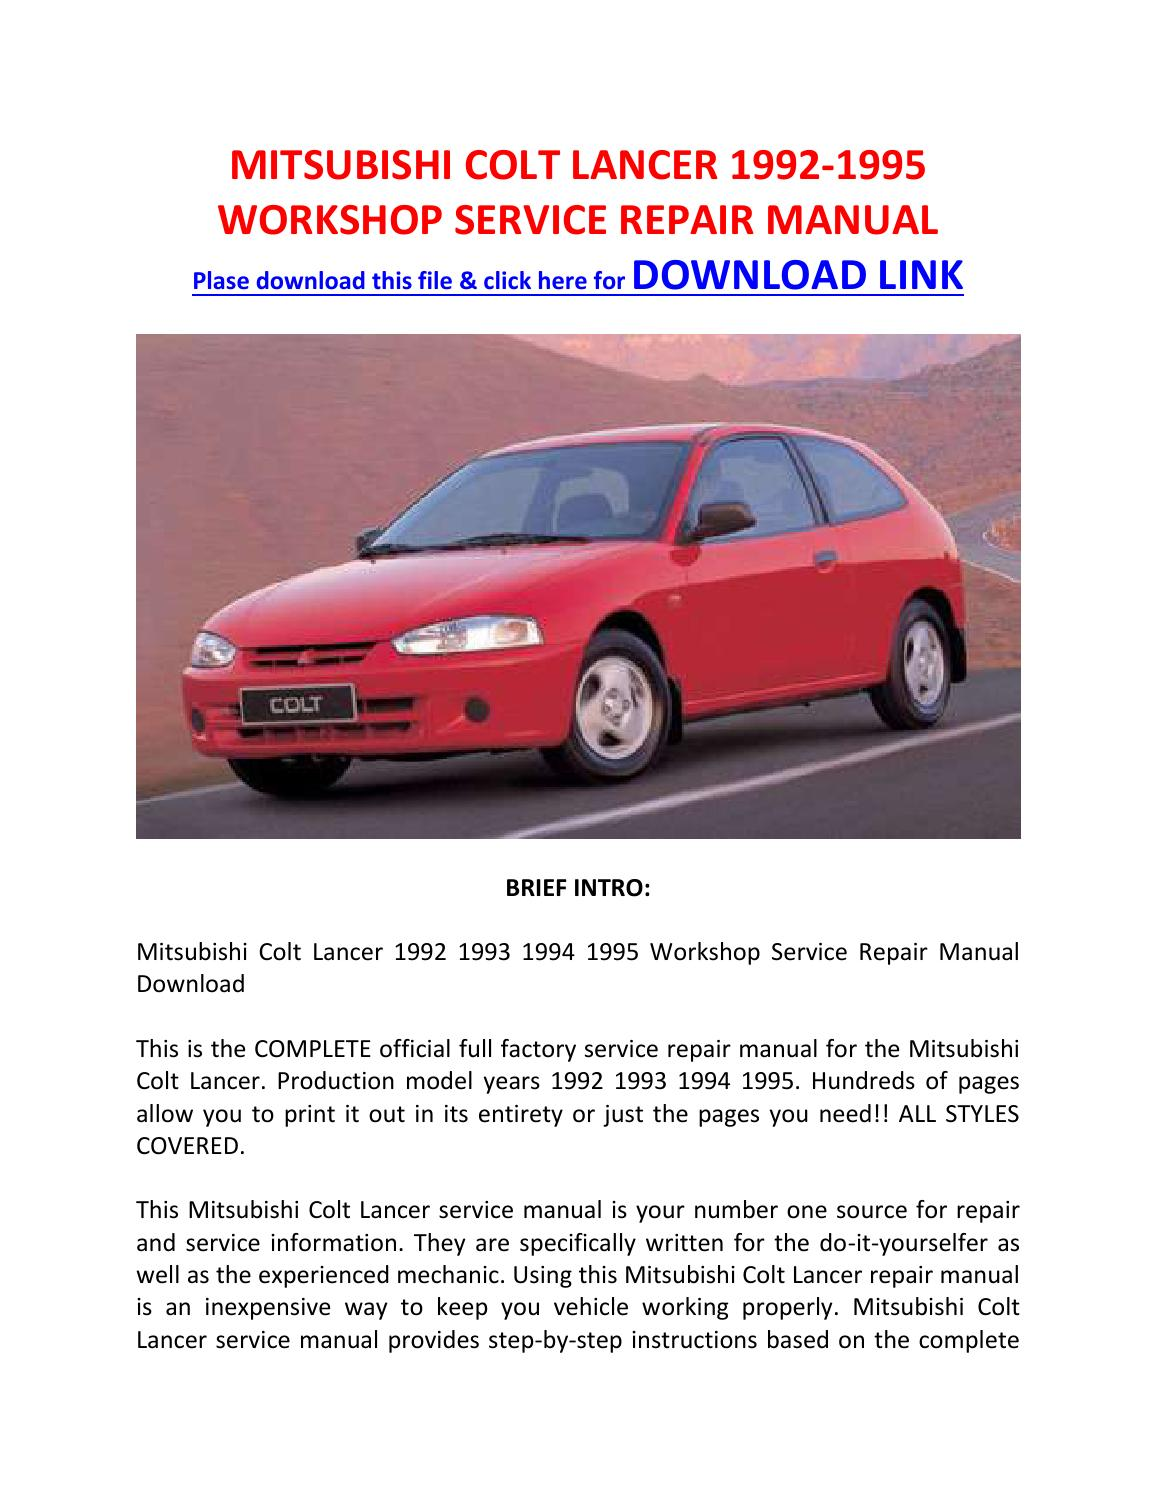 Mitsubishi colt lancer 1992 1995 workshop service repair manual by Pam Per  - issuu